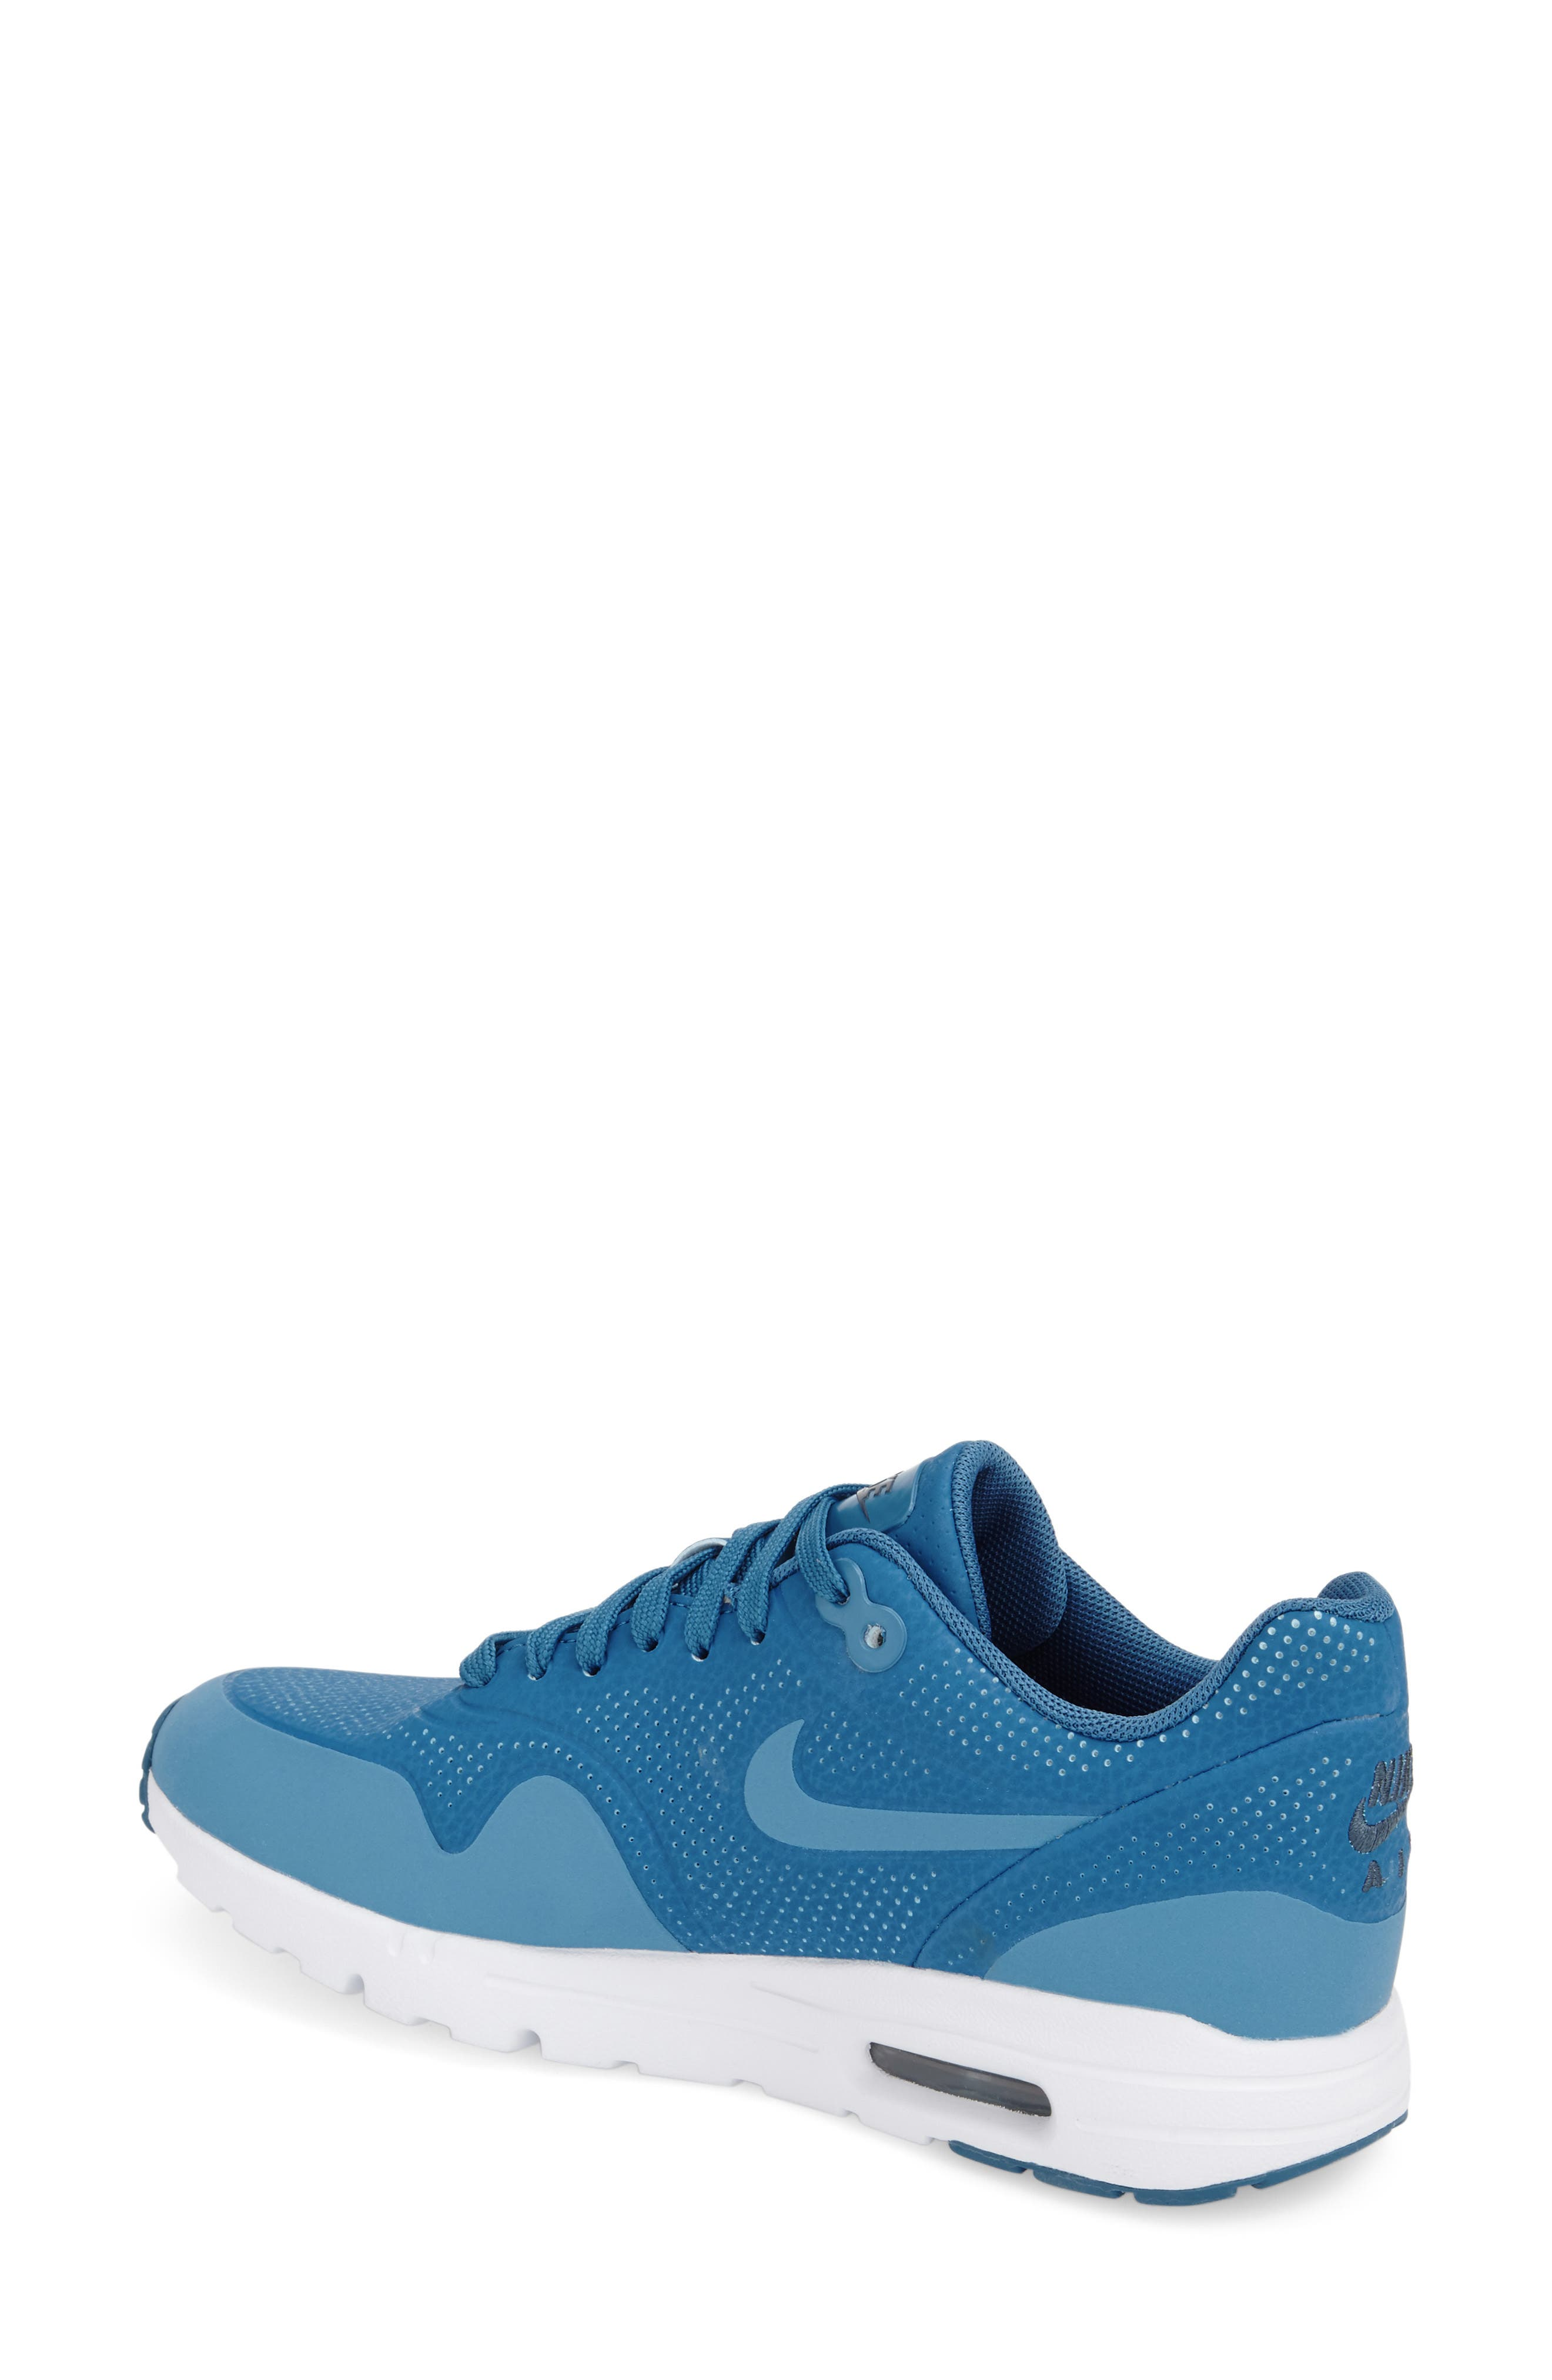 ,                             'Air Max 1 - Ultra Moire' Sneaker,                             Alternate thumbnail 77, color,                             402